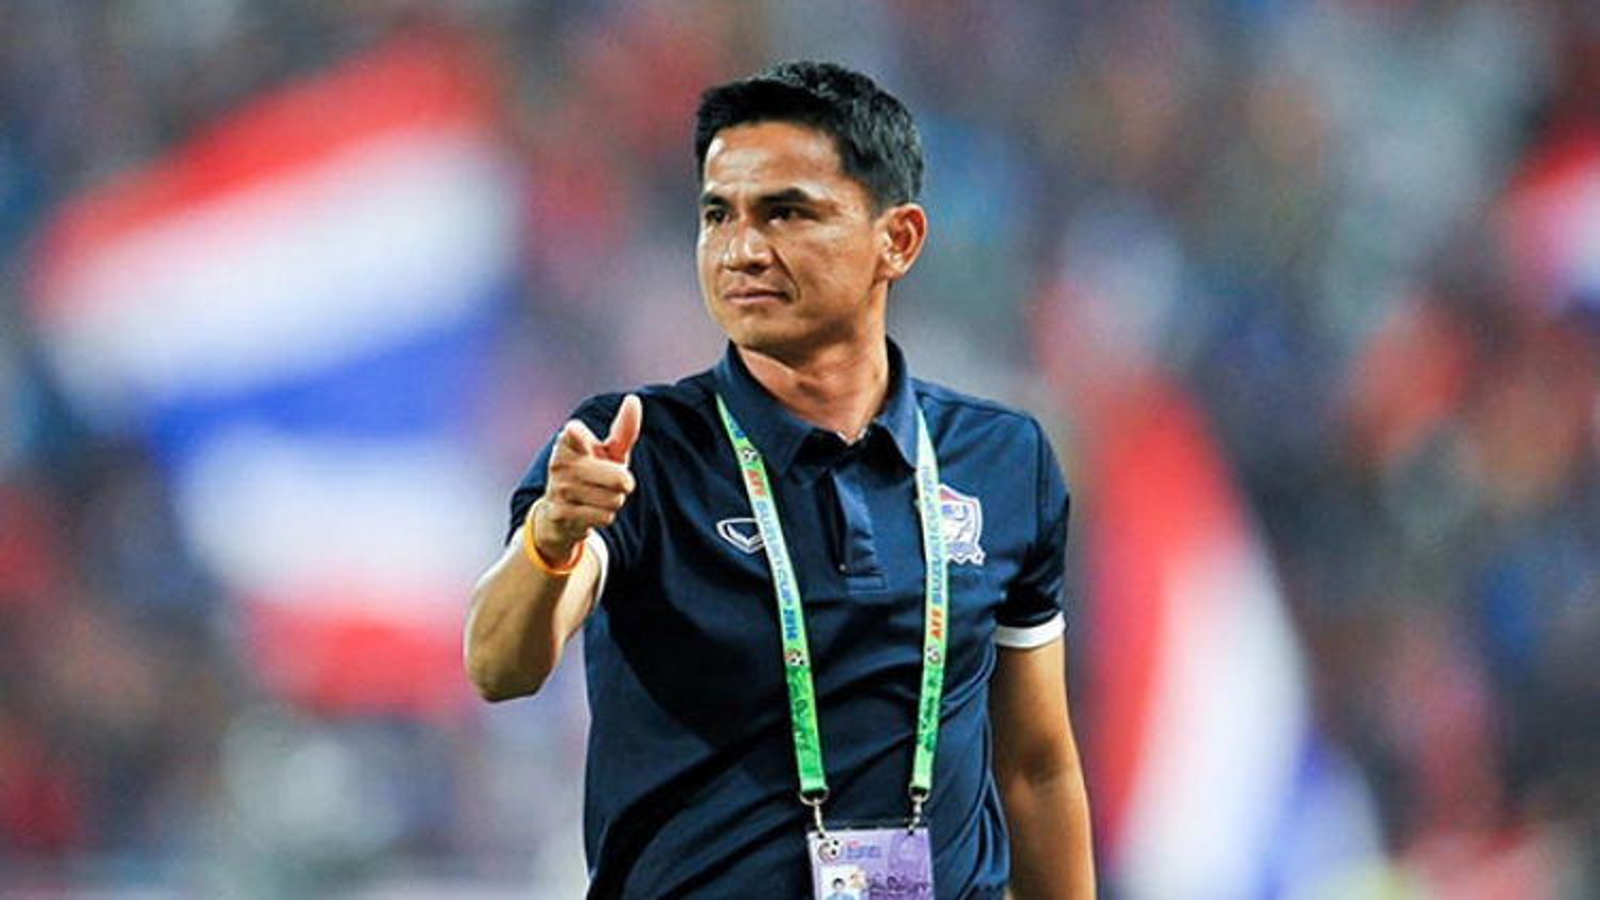 TRỰC TIẾP Sài Gòn FC - HAGL: Chờ HLV Kiatisuk trổ tài